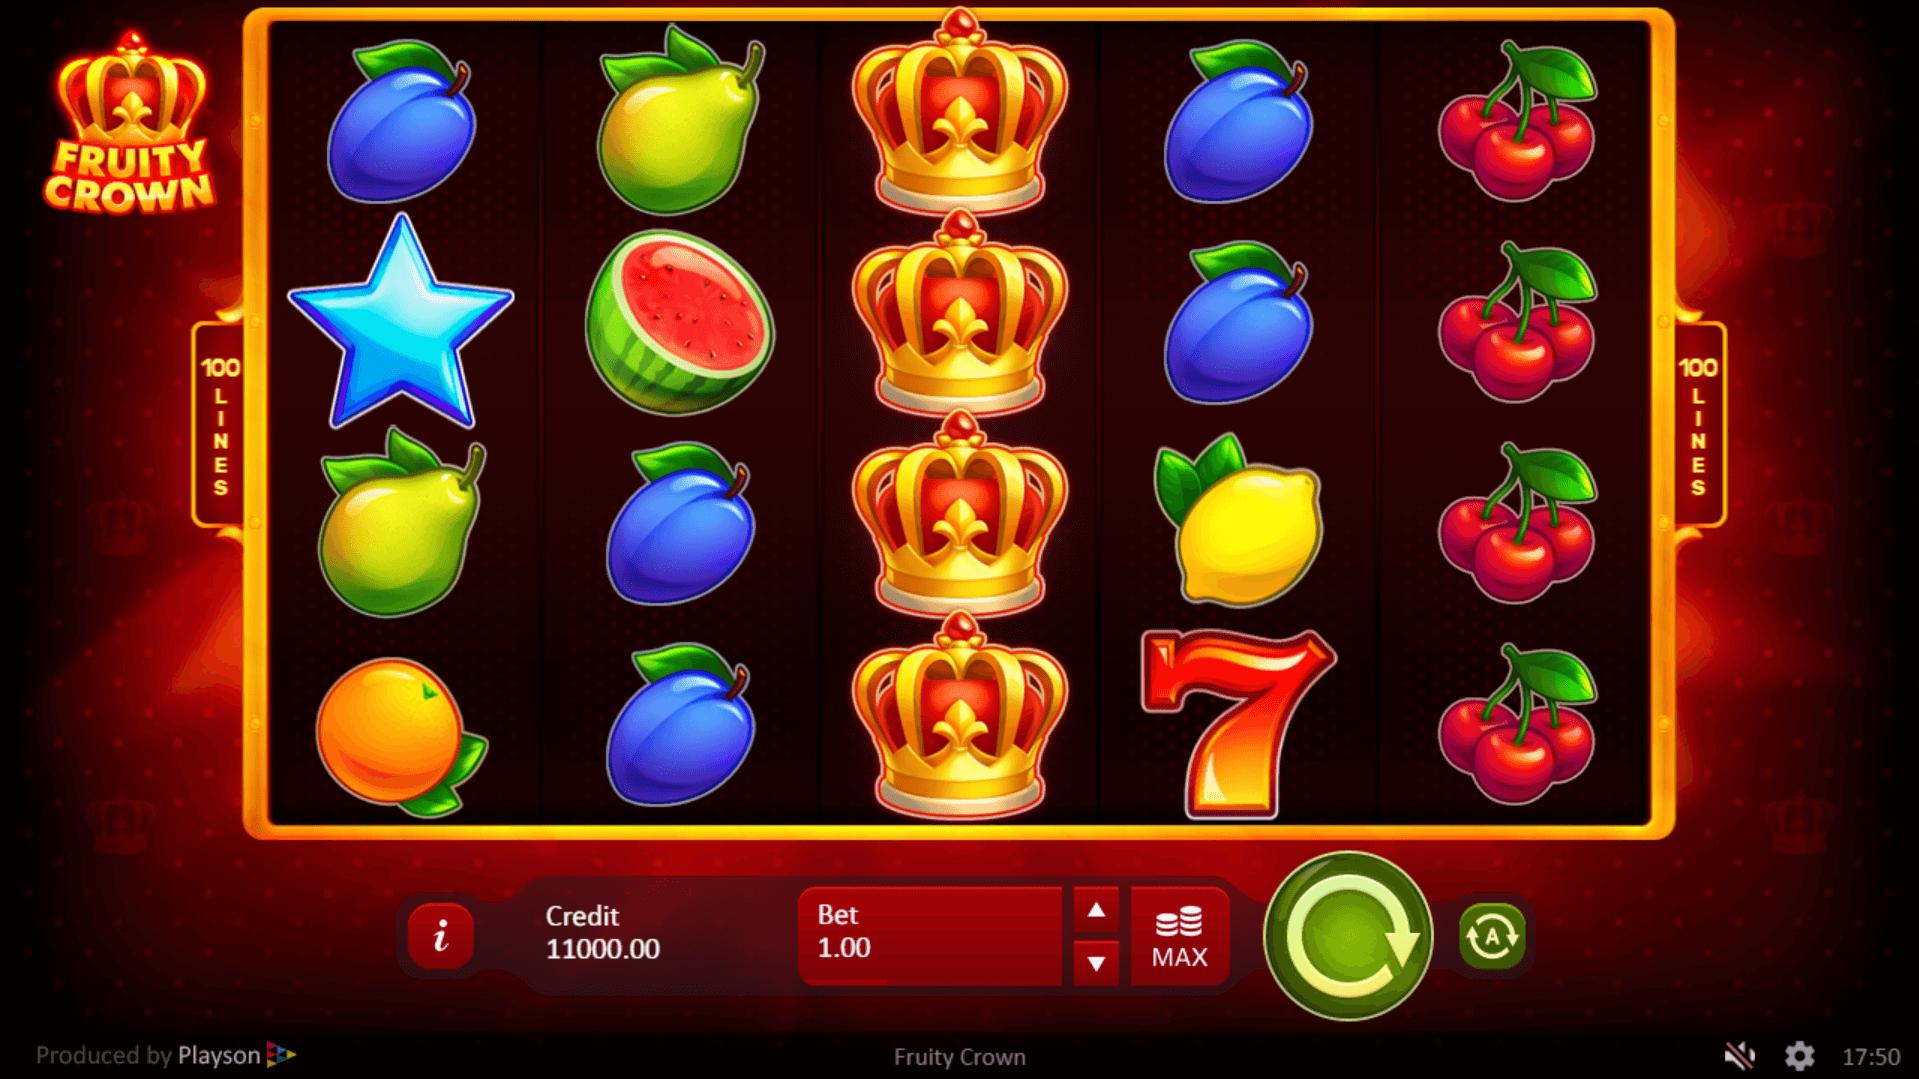 Fruity Crown slot machine screenshot